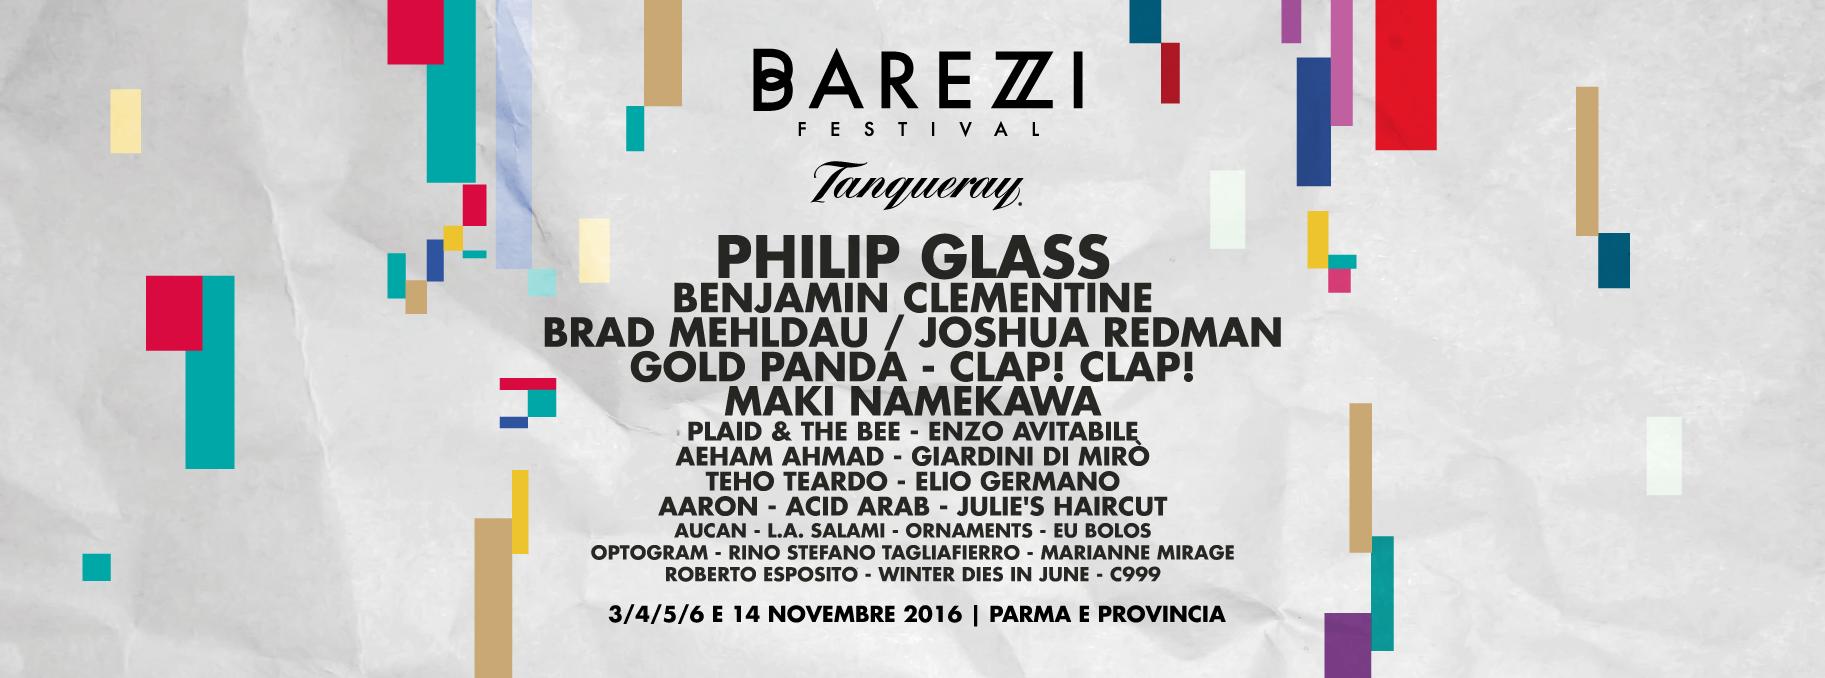 barezzi-festival-1